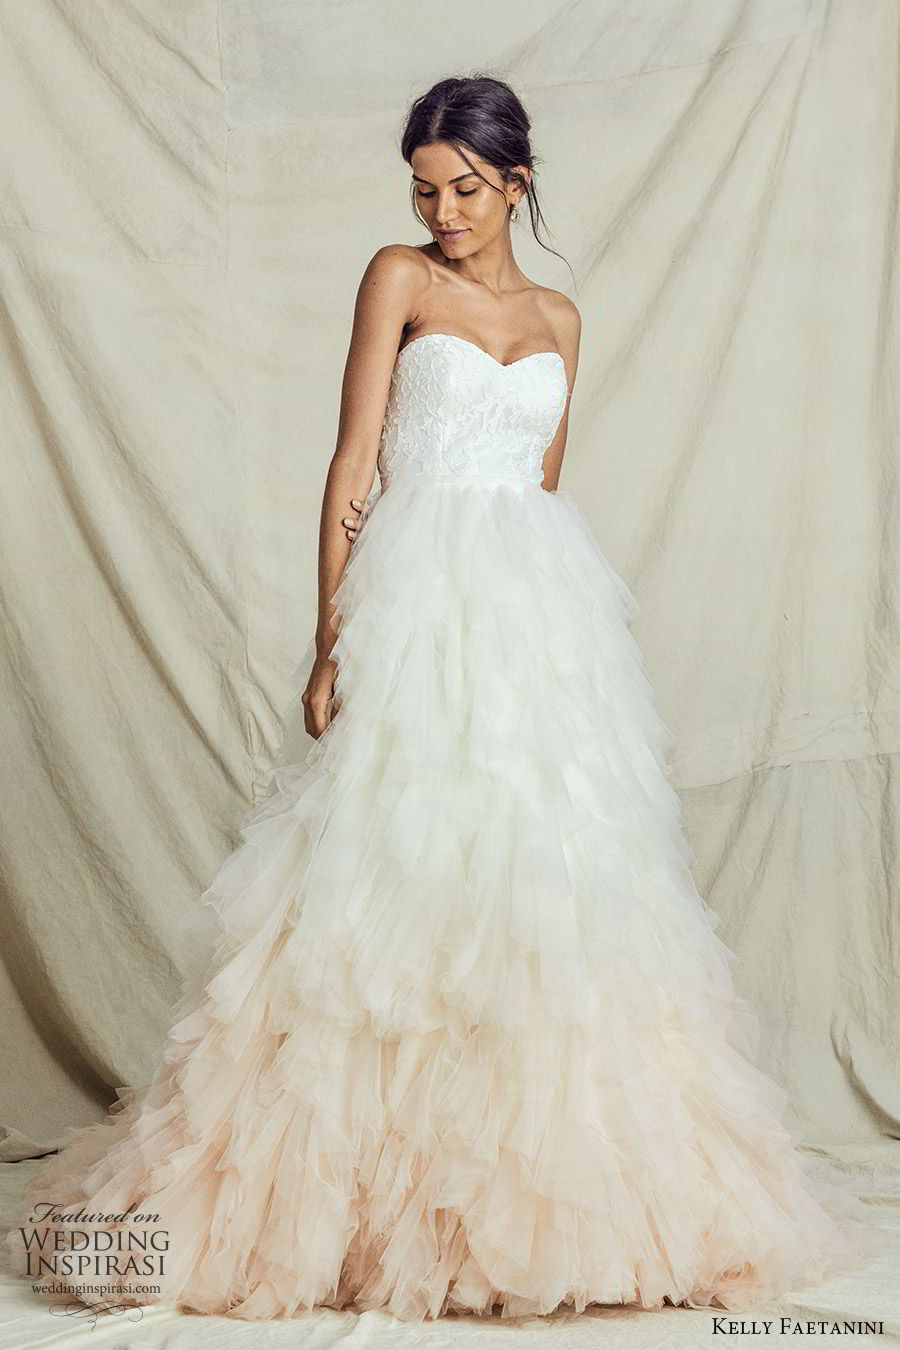 kelly faetanini fall 2019 bridal strapless sweetheart lace bodice a line ball gown wedding dress ruffle skirt ombre blush romantic elegant (7) mv